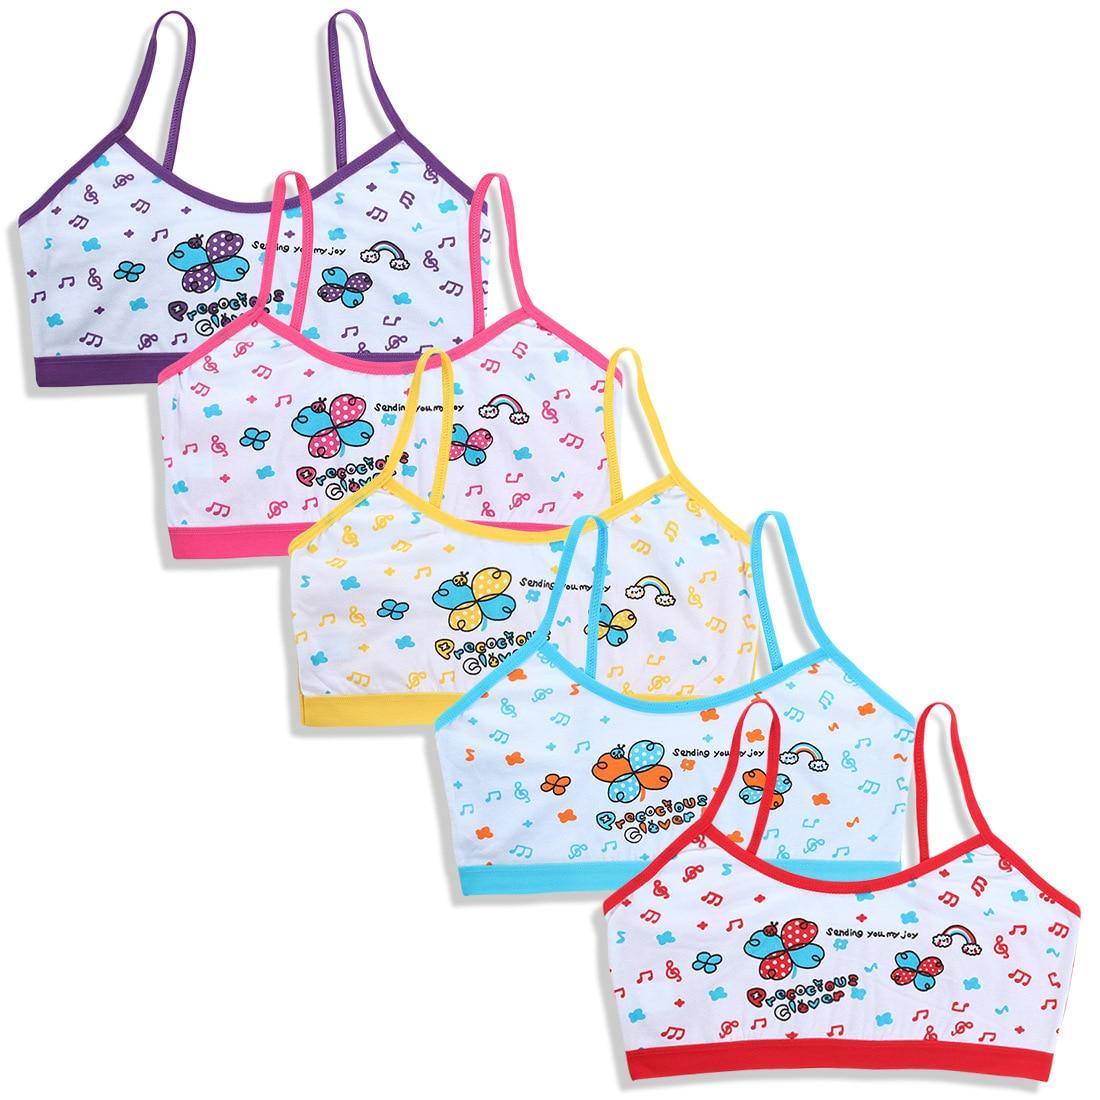 4Pc/Lot Teenager Tank Top For Girls Cotton Underwear Model Cartoon Kids Singlets Children Camisole Baby Bras Undershirt 1